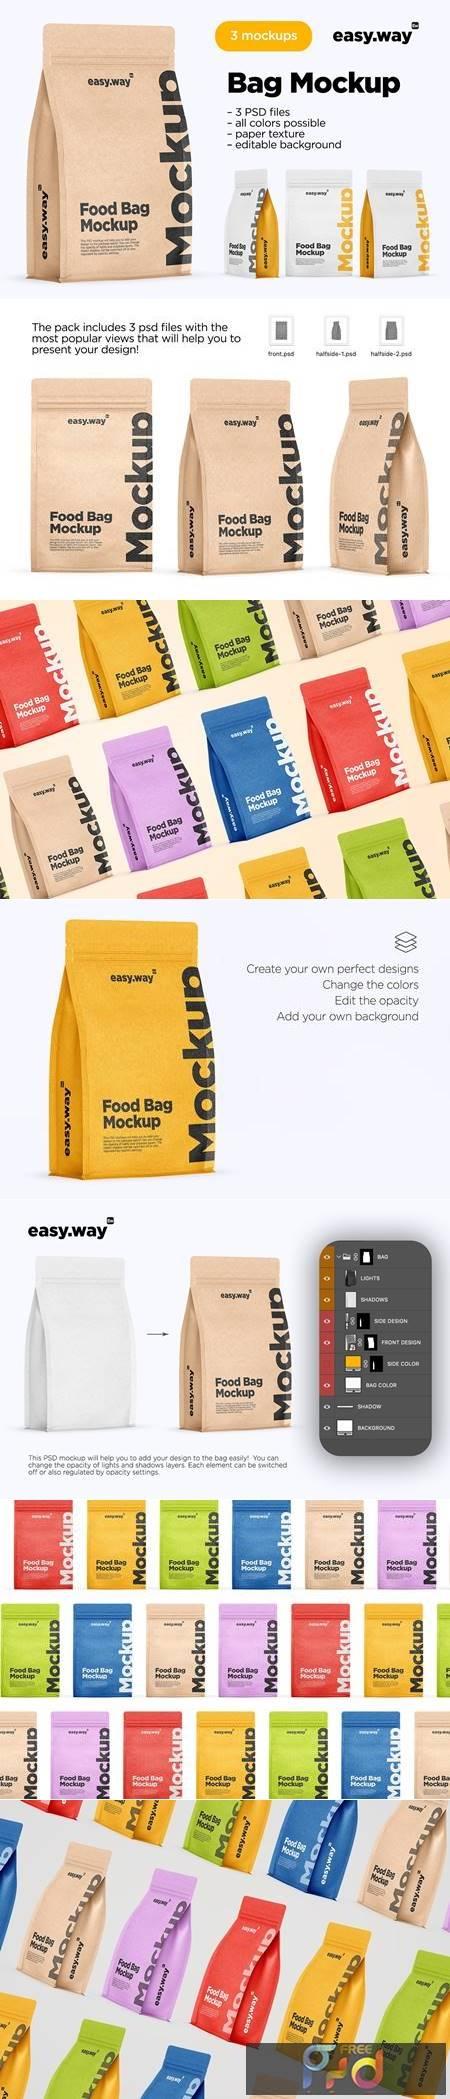 Paper Coffee Bag Mockup 5547171 1